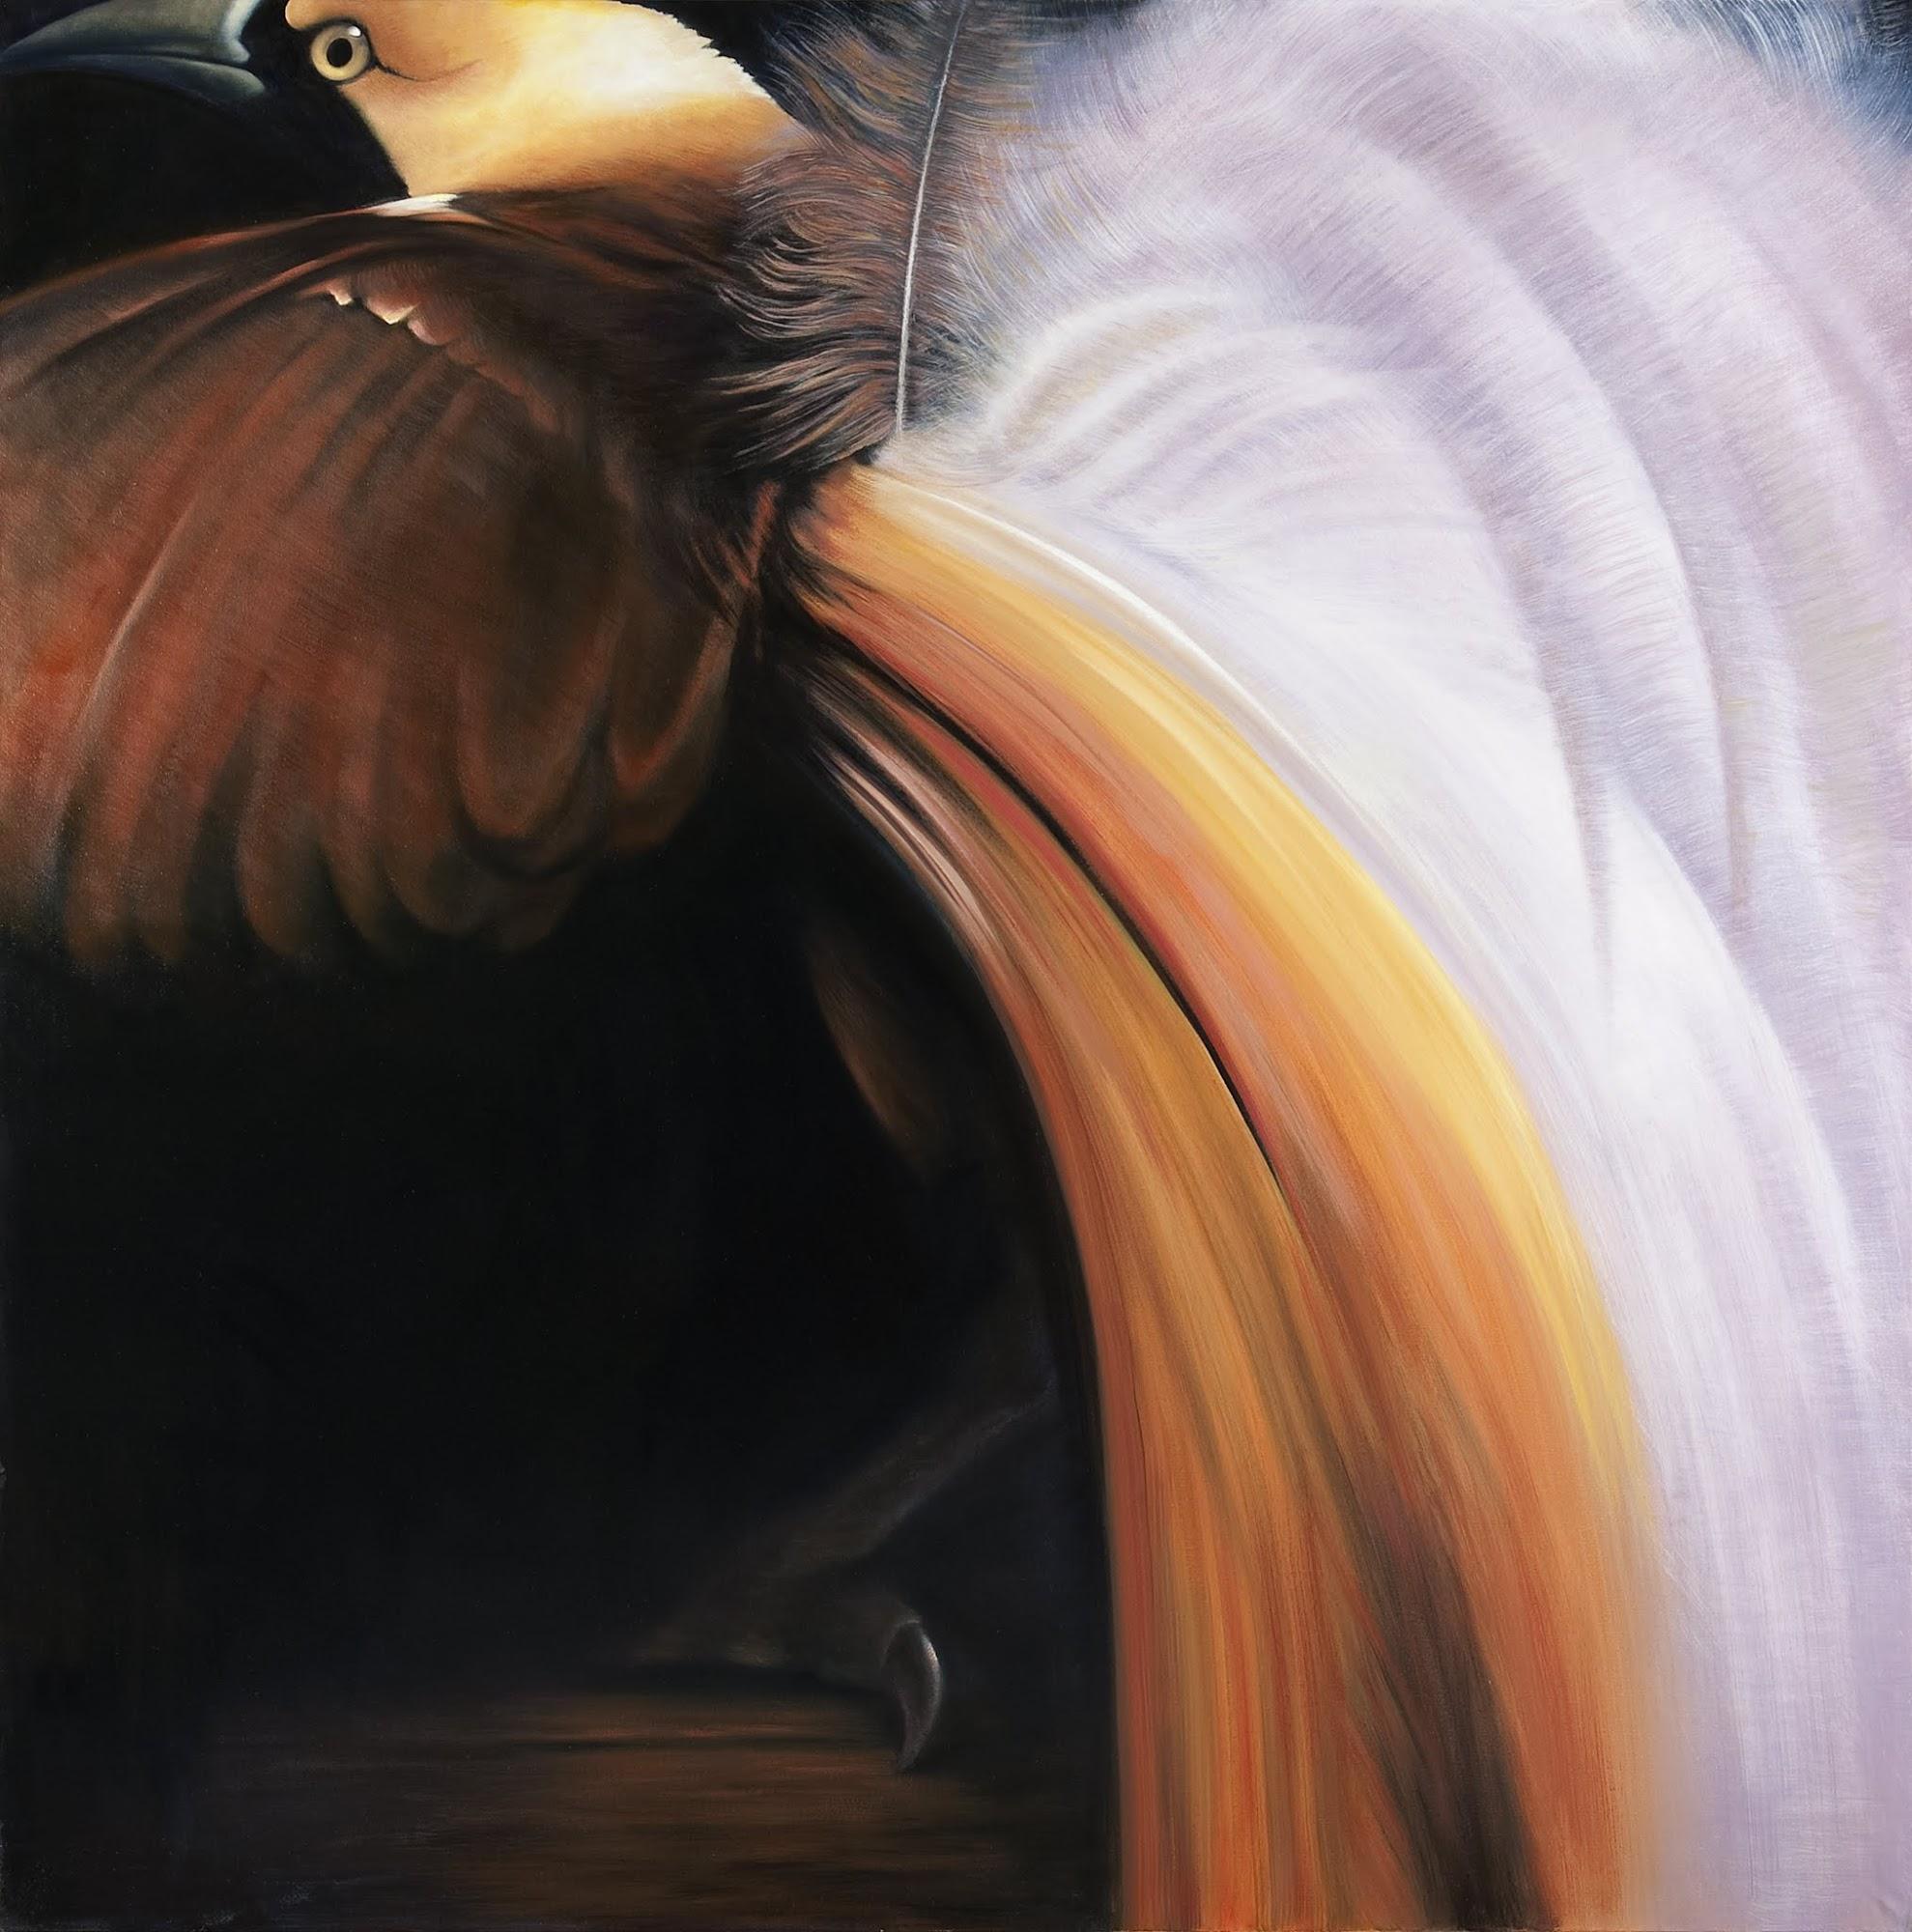 Augenblick im Paradies   2009   Oel auf Leinwand   170 x 170 cm